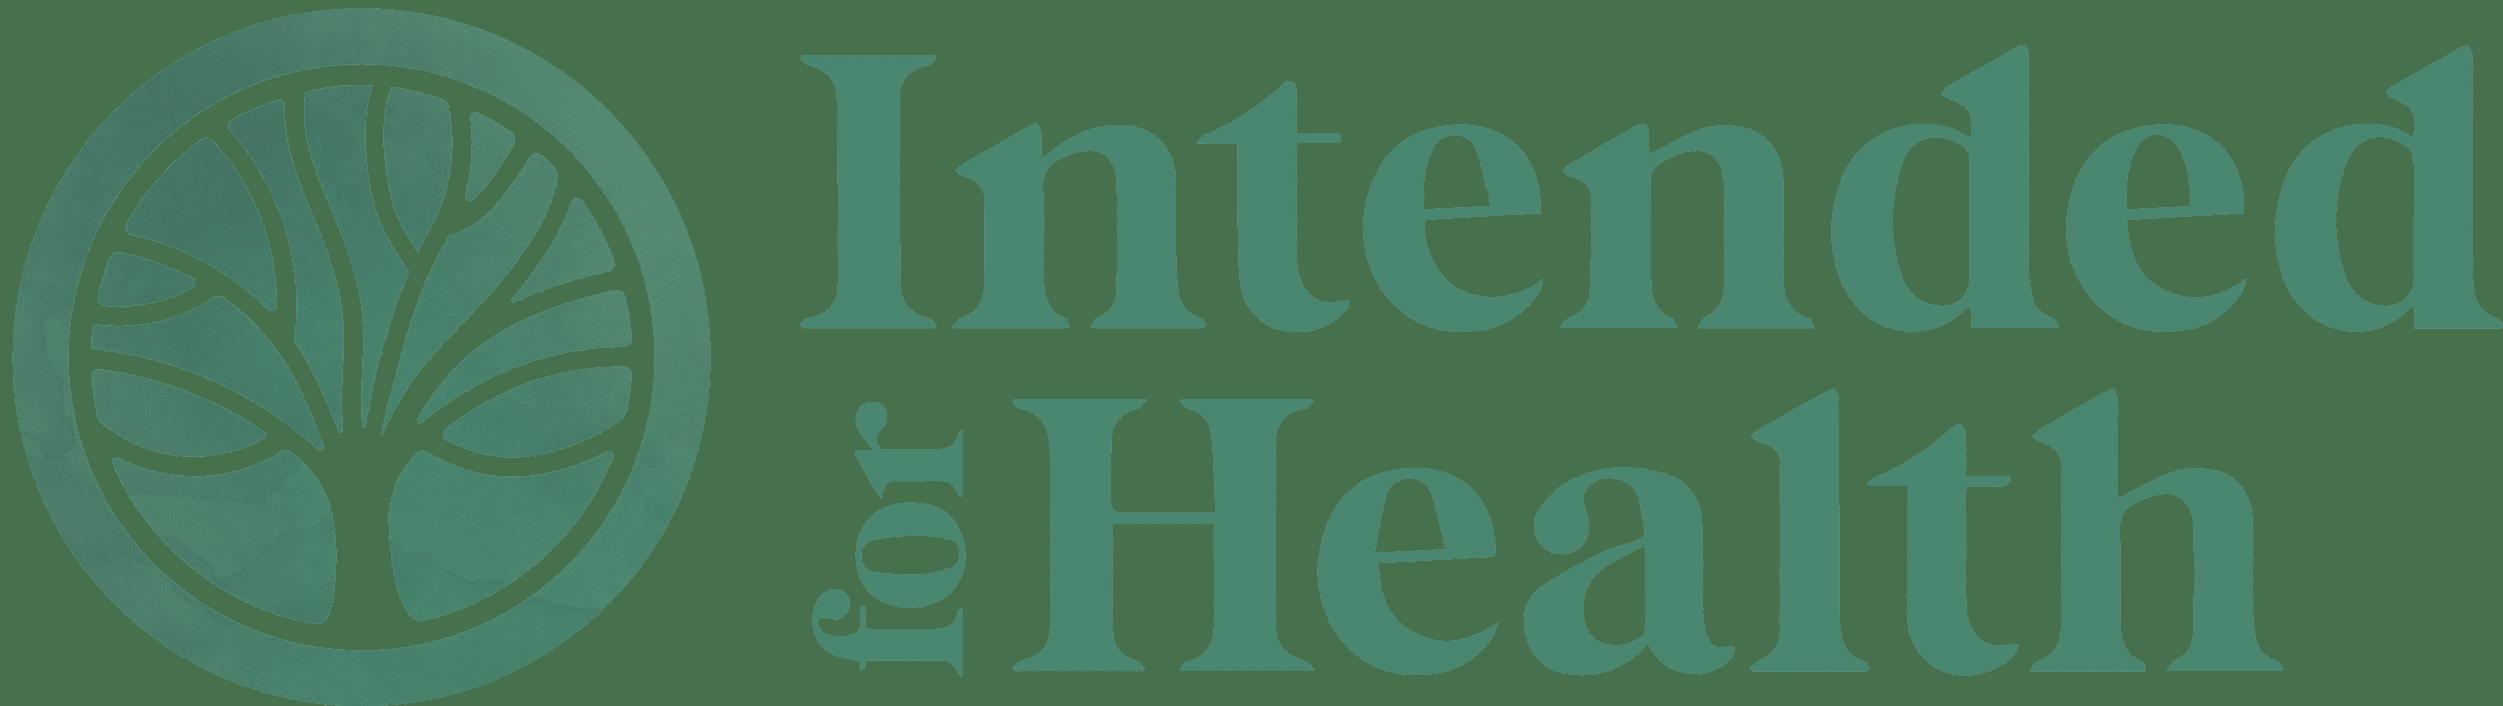 Bredesen Alzheimer's Treatment | Dementia Prevention | Intended for Health | Lisa TerHaar | Twin Cities, Minnesota